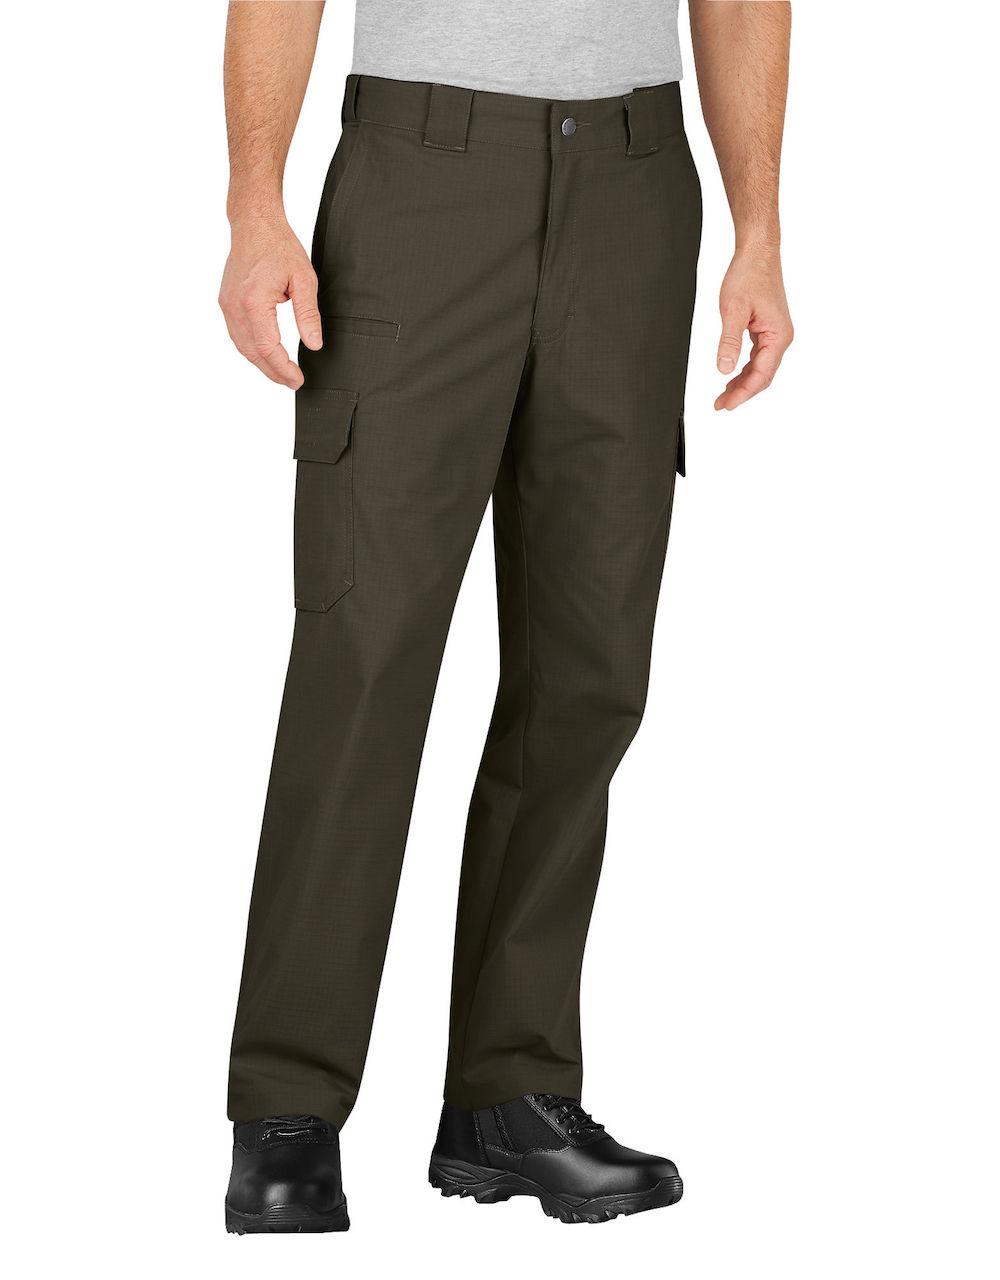 Mens Clothing Cargo Pants